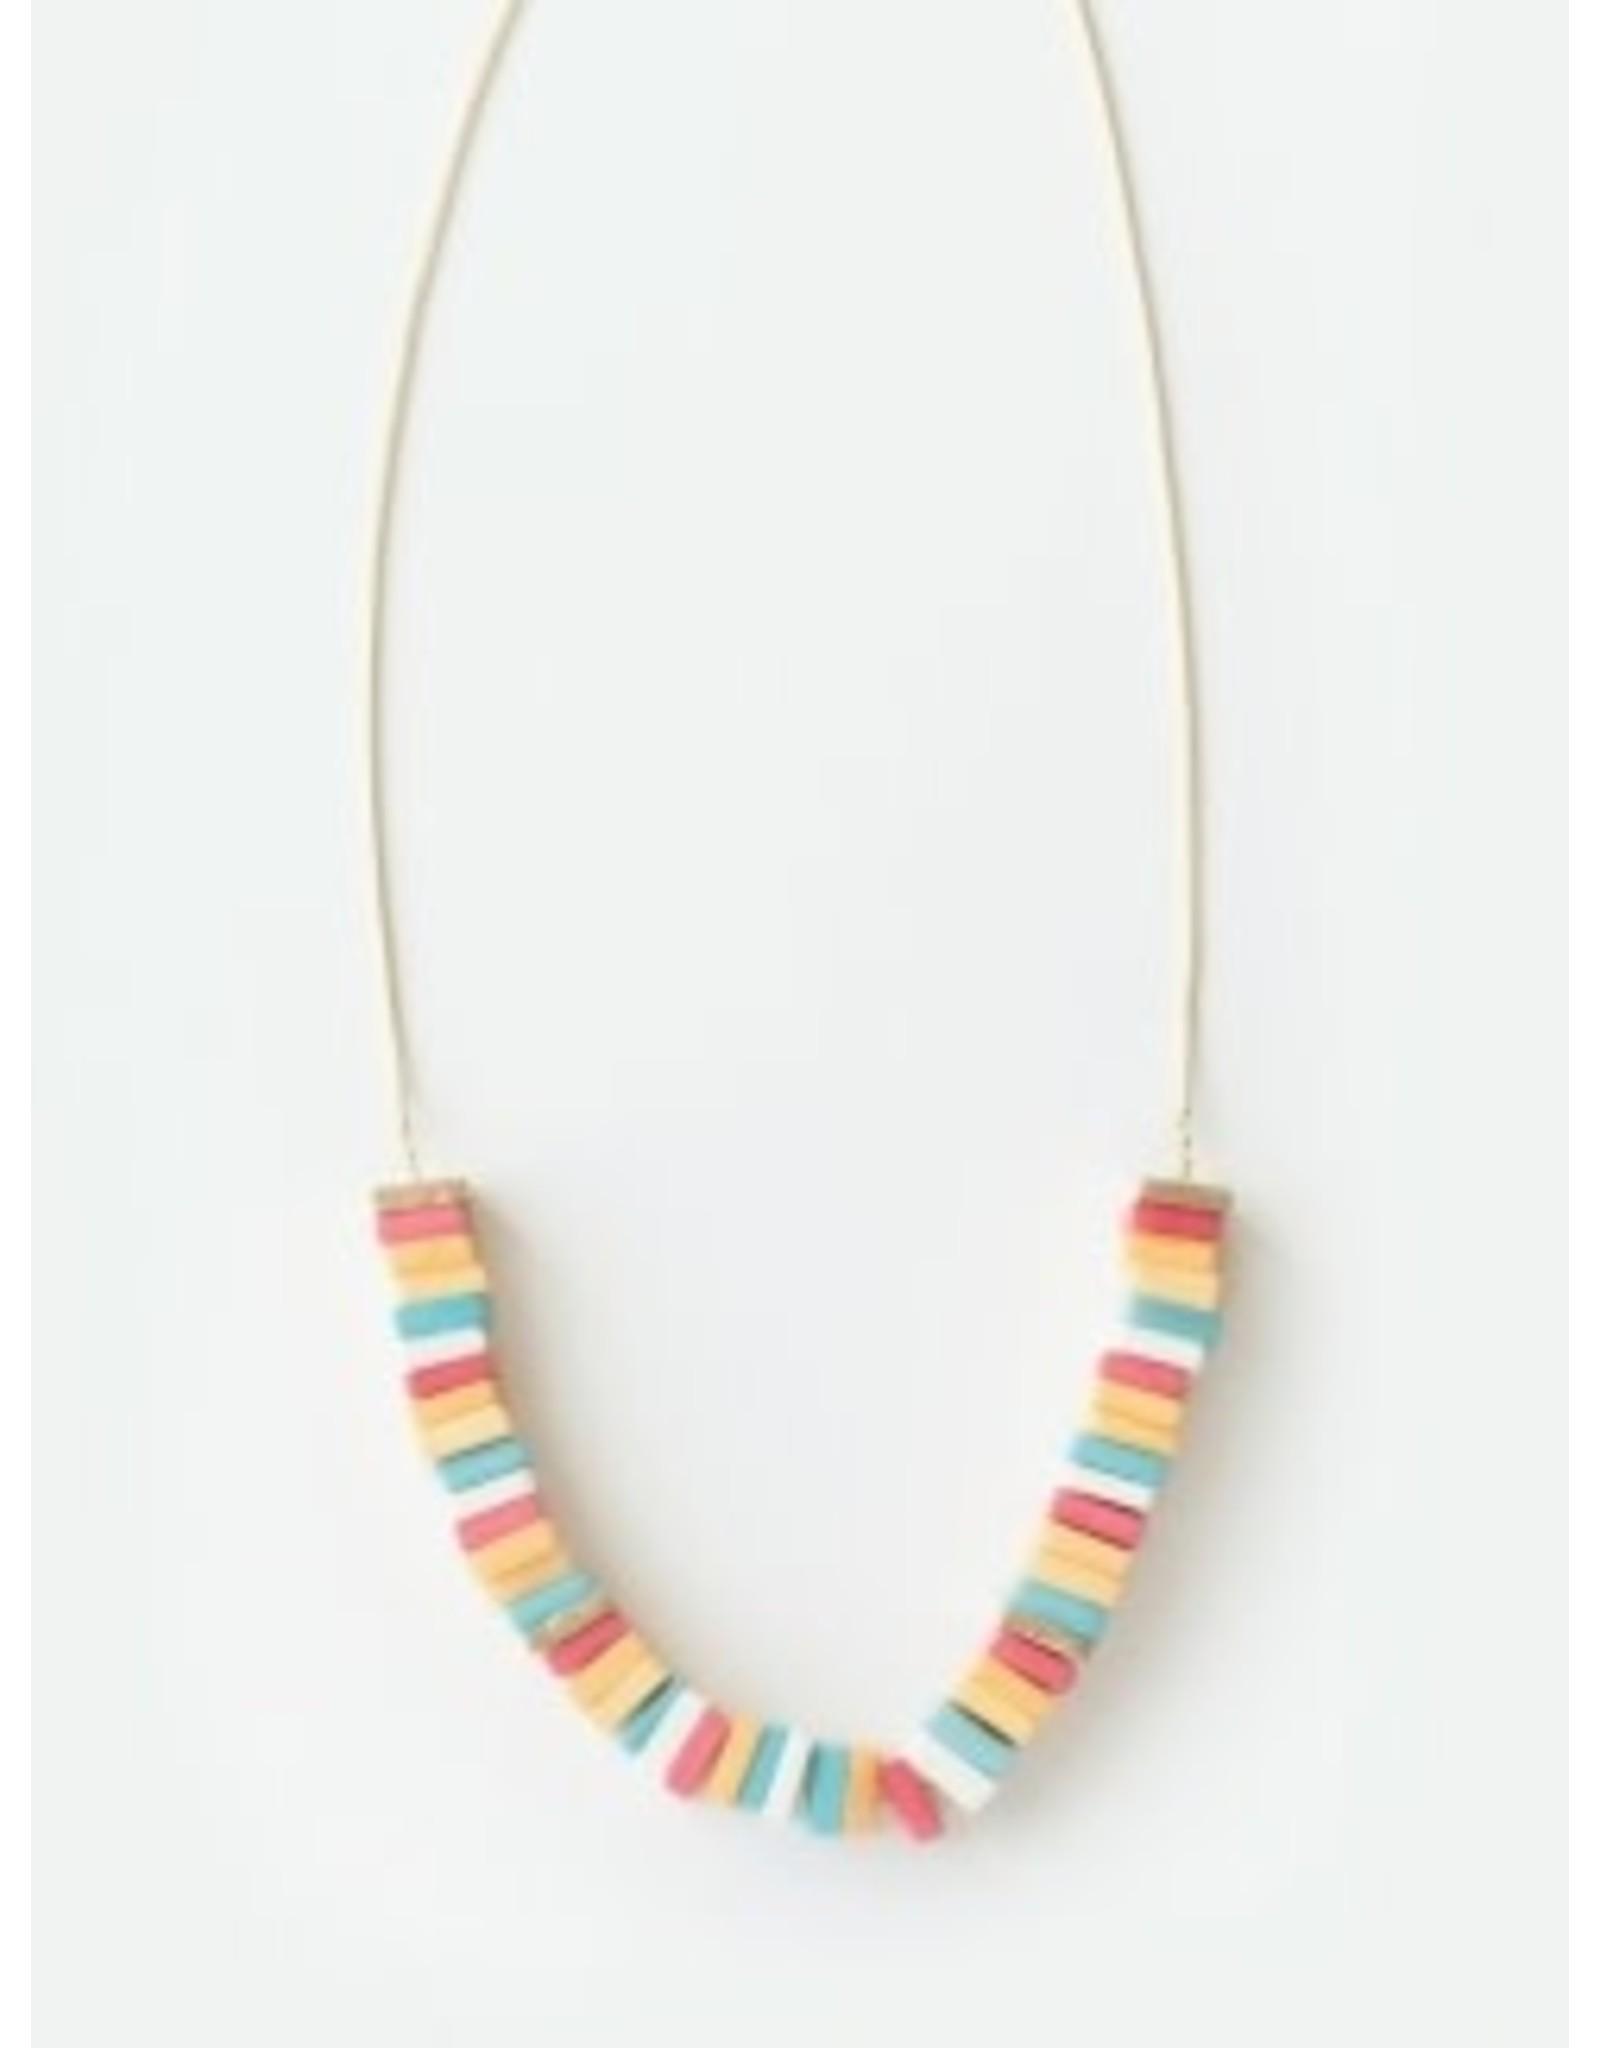 Coney Island Candy Rainbow Necklace, India